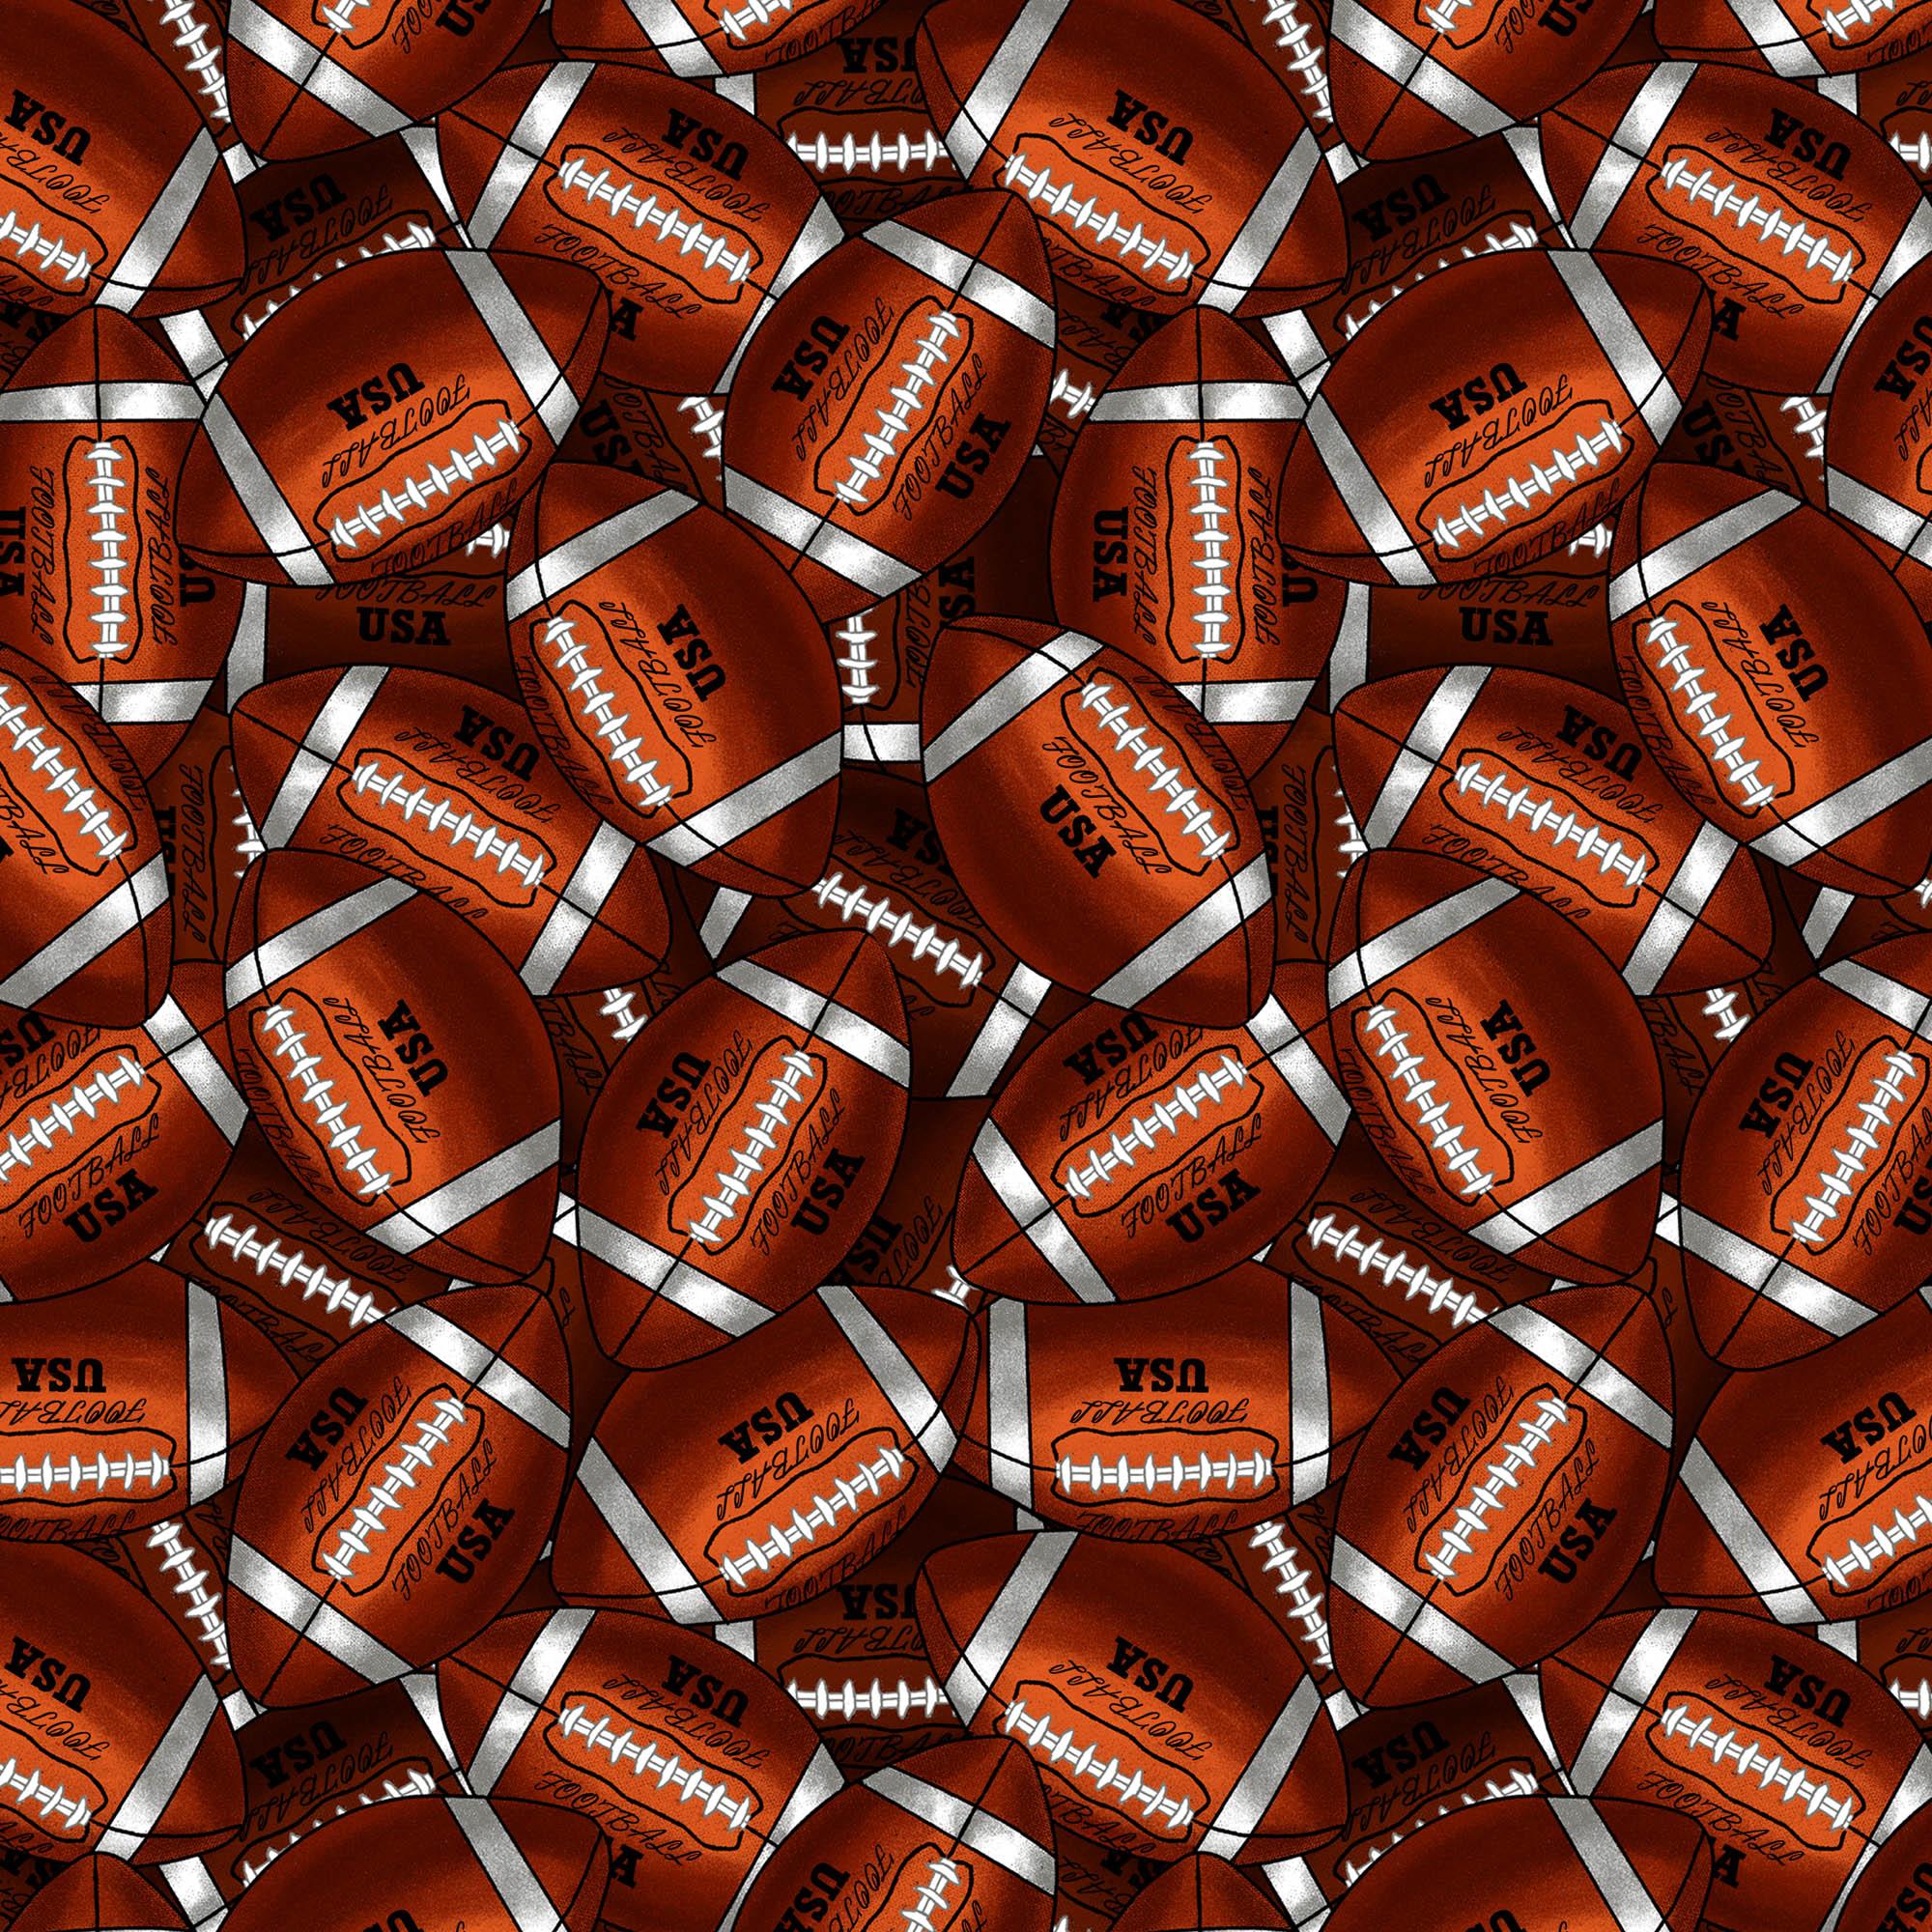 David Textiles Cotton Precut Fabric Packed Footballs 1 Yd X 44 Inches